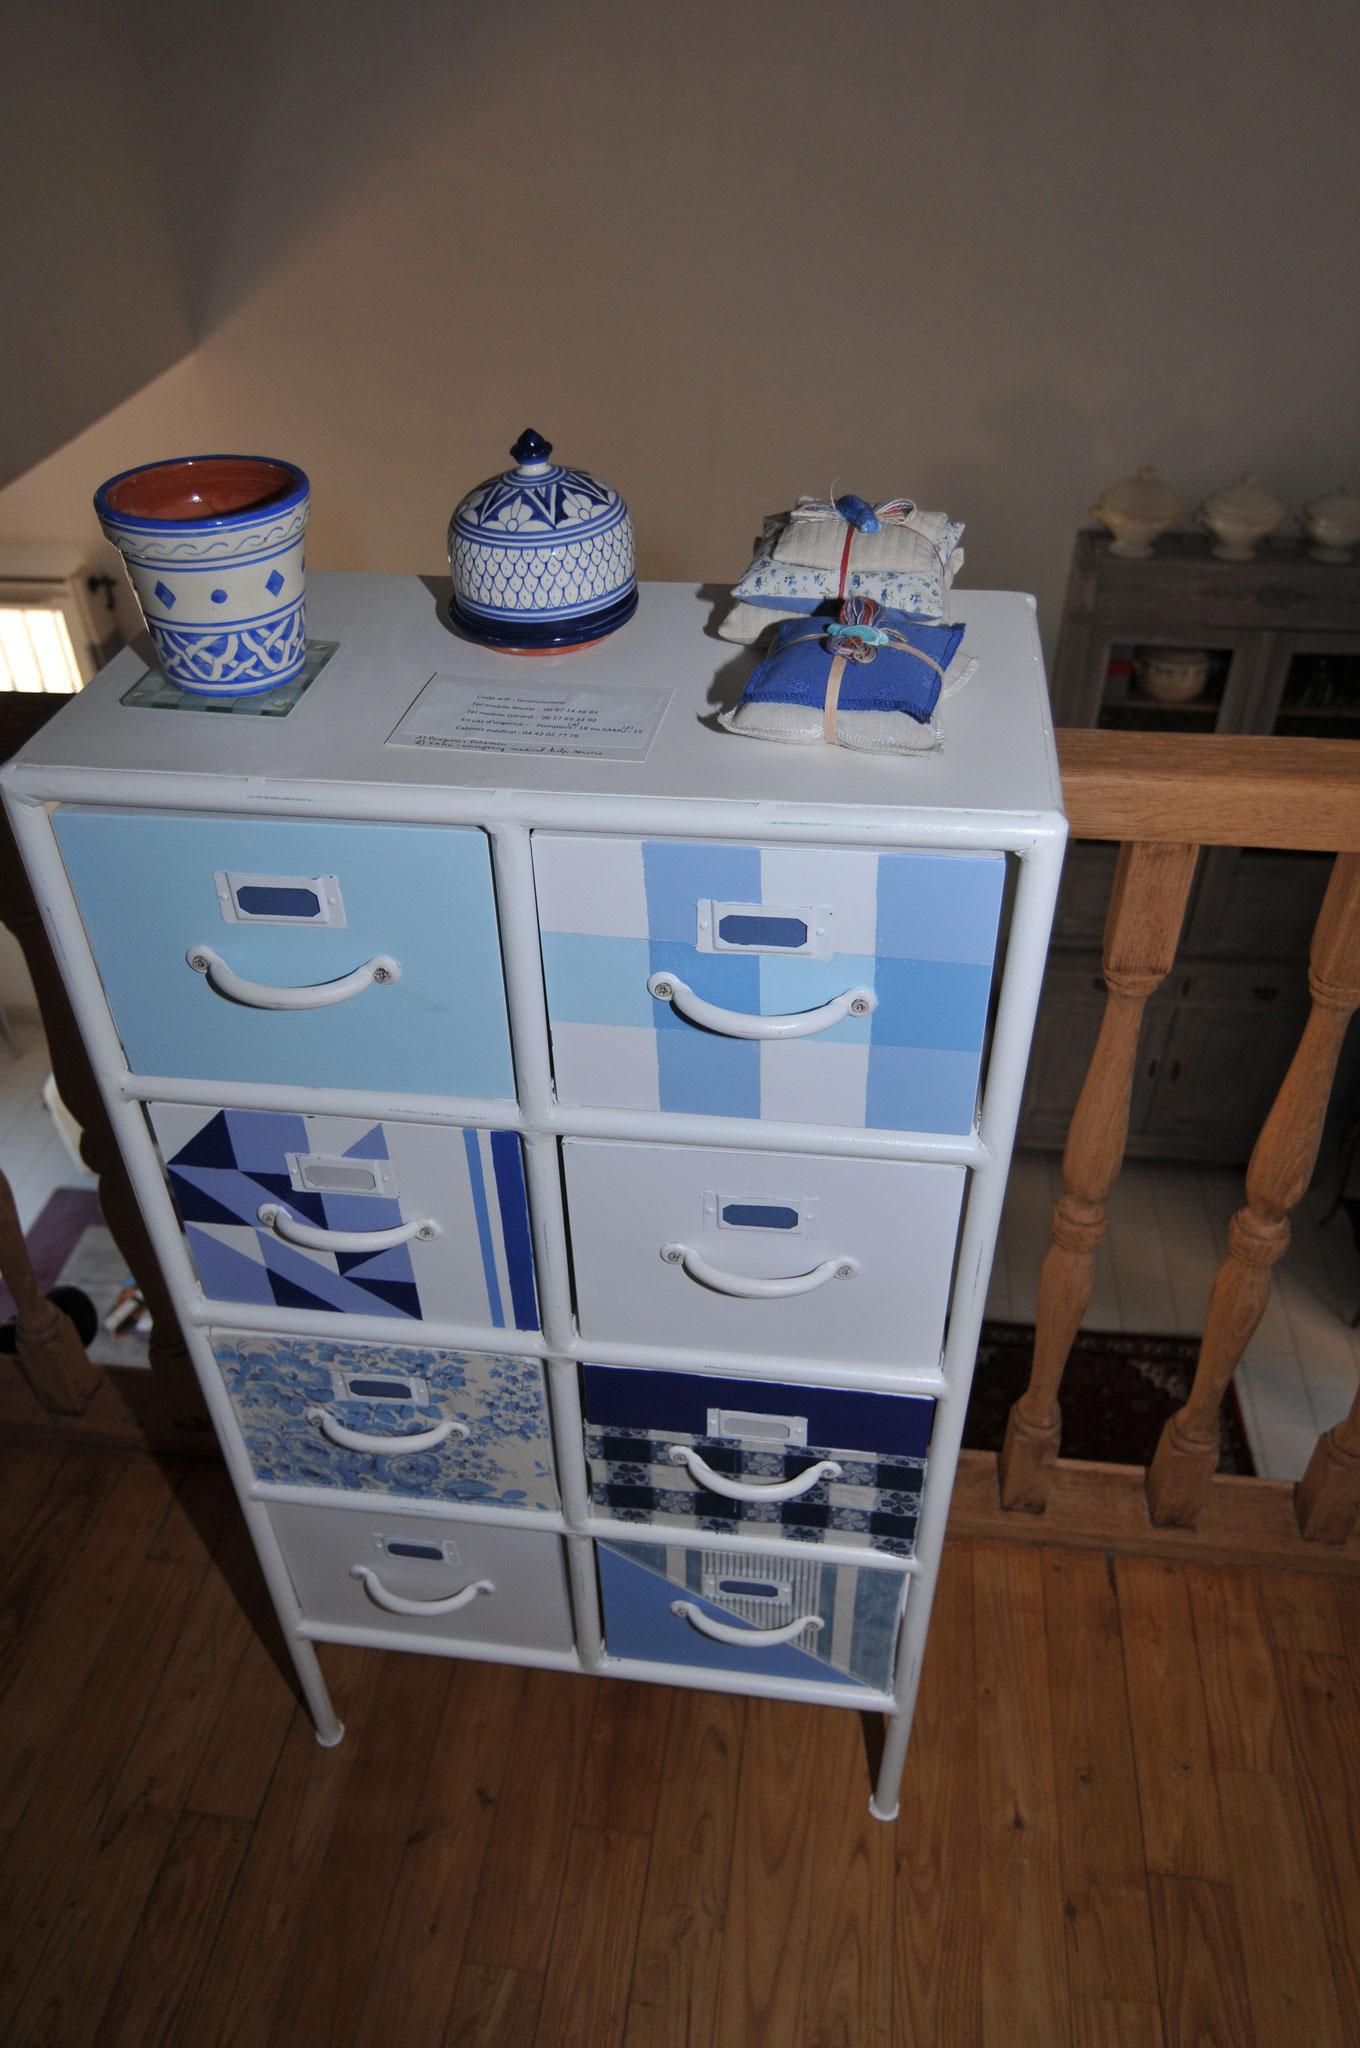 meuble métier relooké en camaieu de bleus